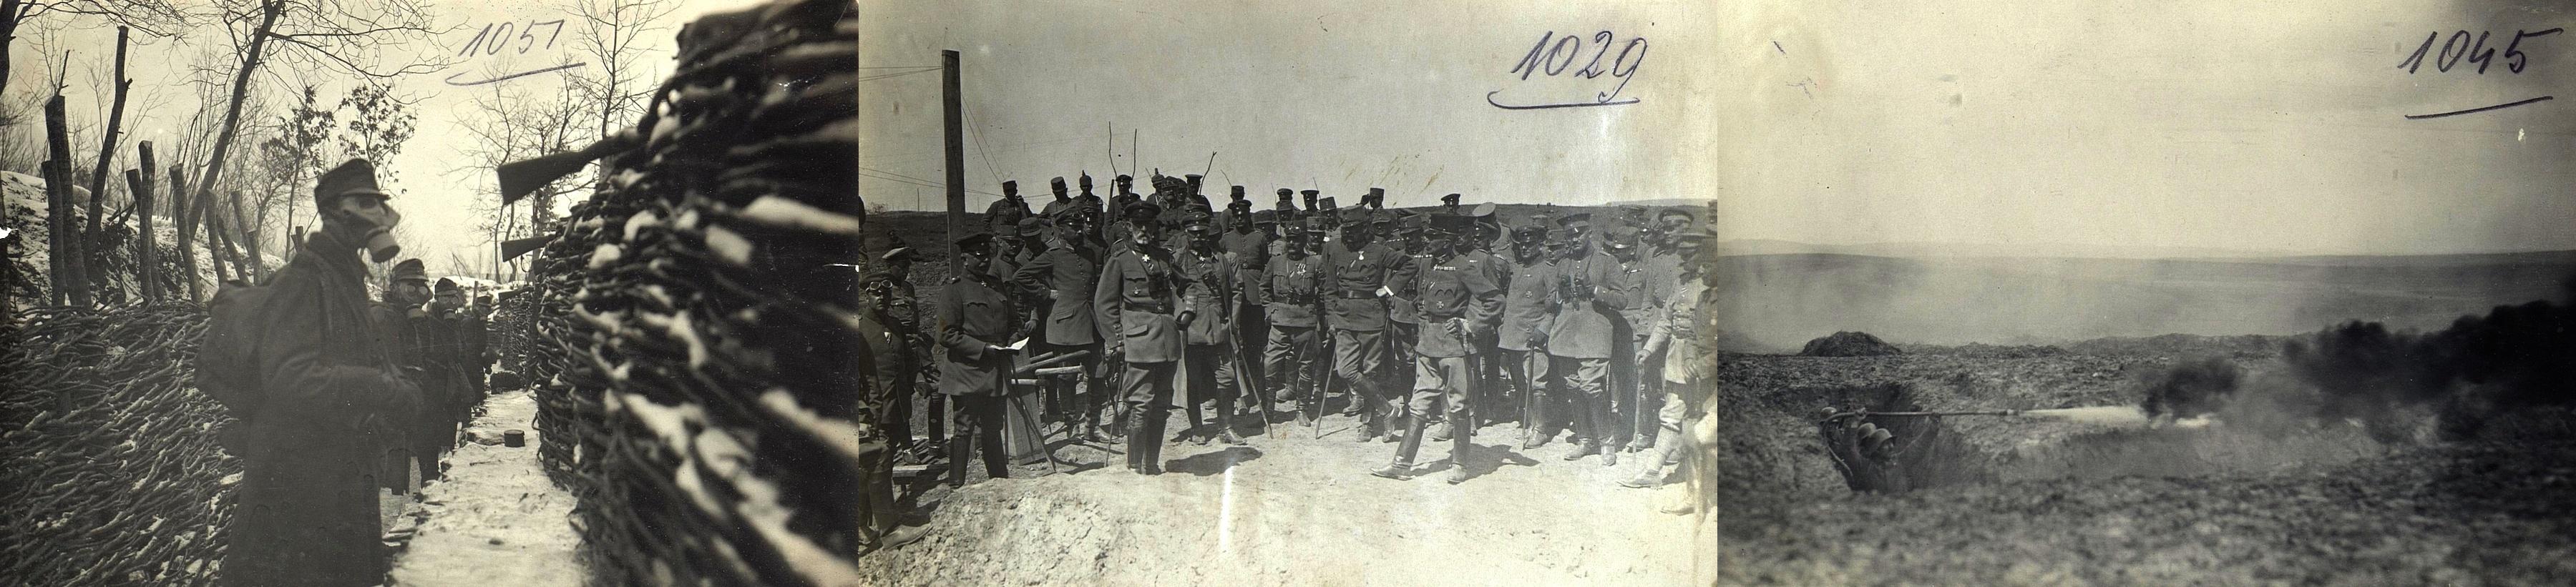 Military training exercises around Rohatyn, 1916